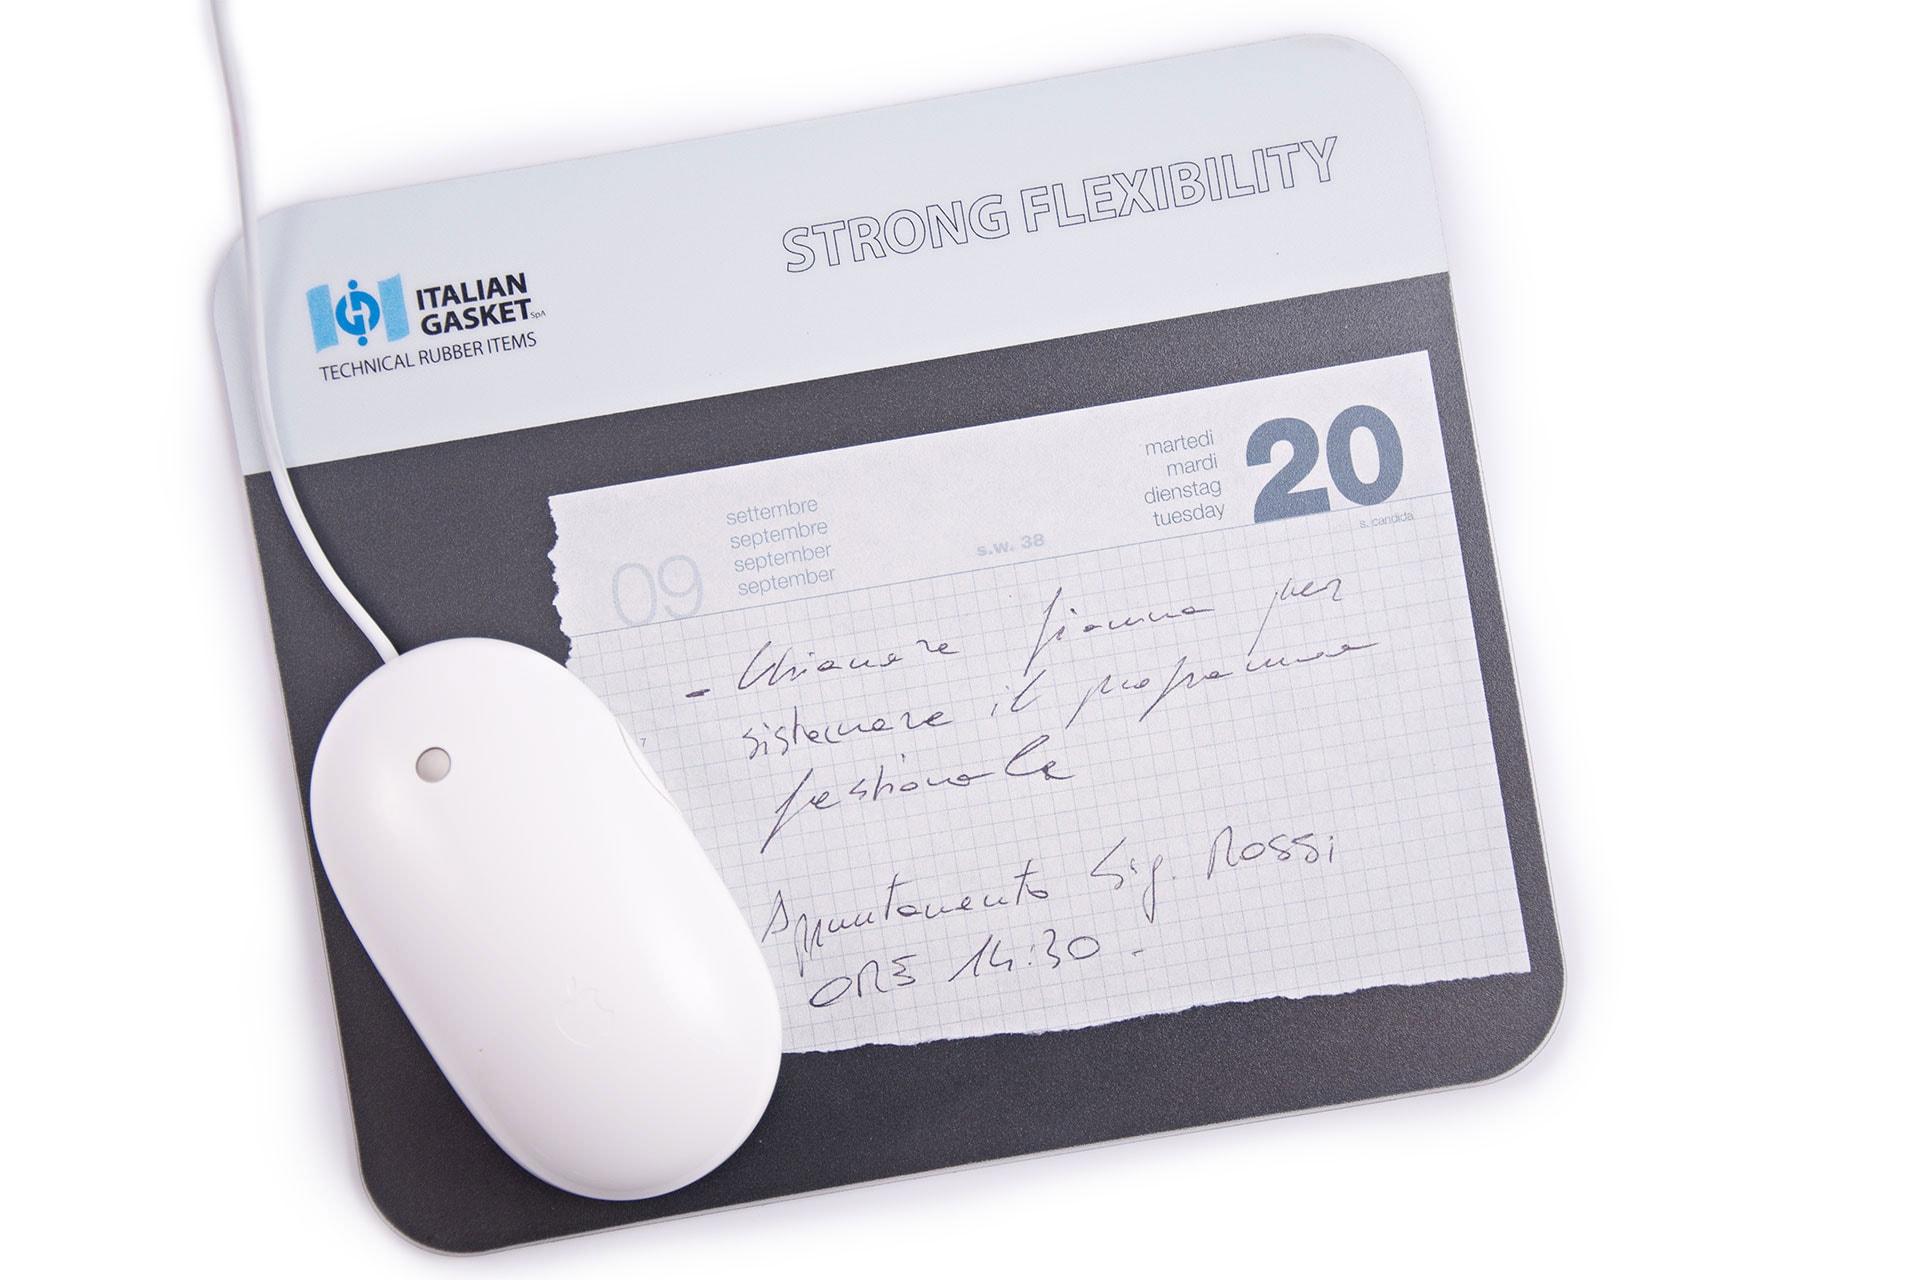 Mouse pad portadocumenti blocknotes